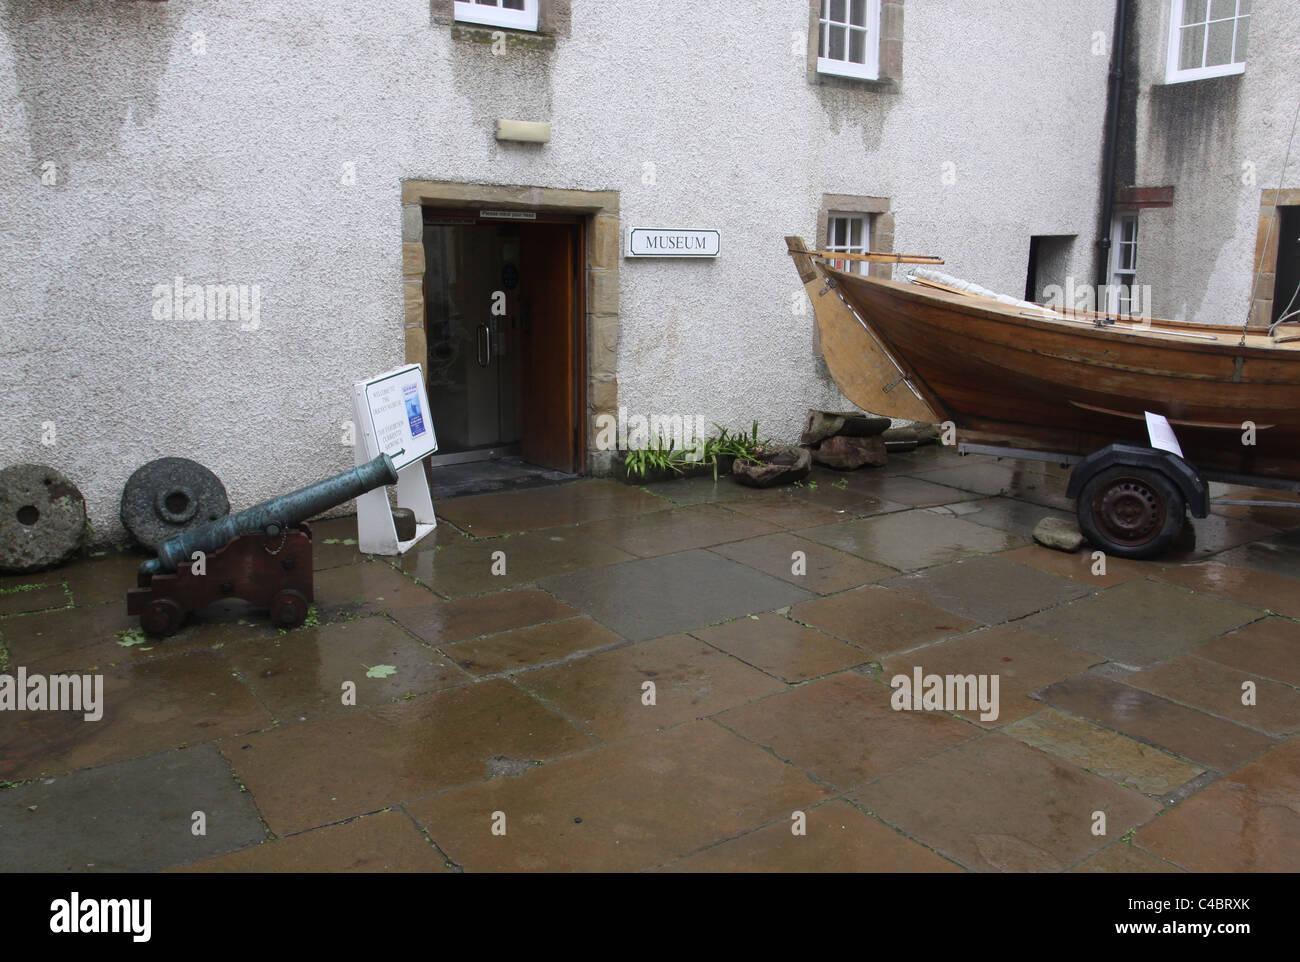 Kirkwall Museum Orkney Scotland May 2011 - Stock Image